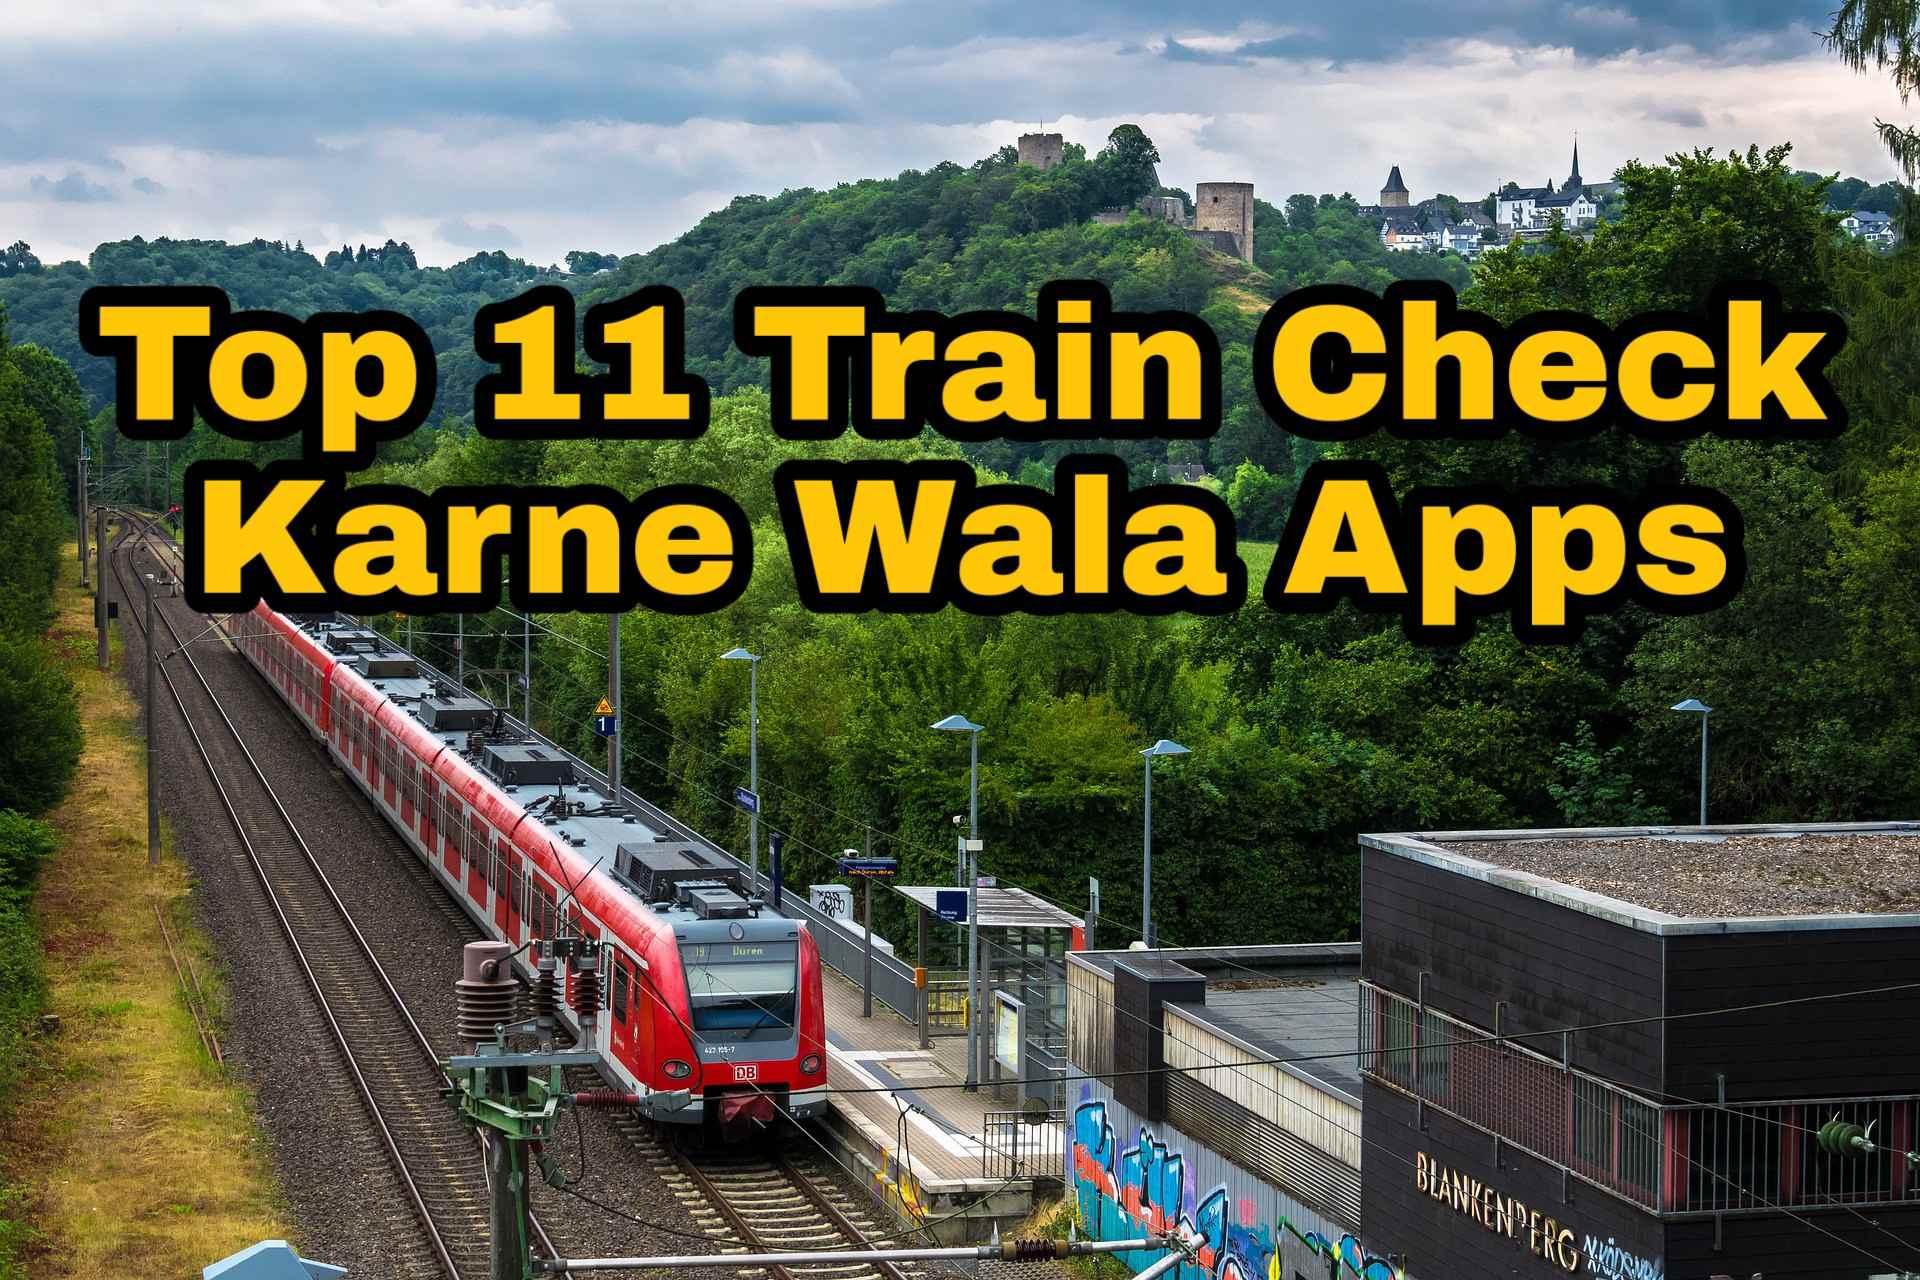 Train Check करने वाला Apps